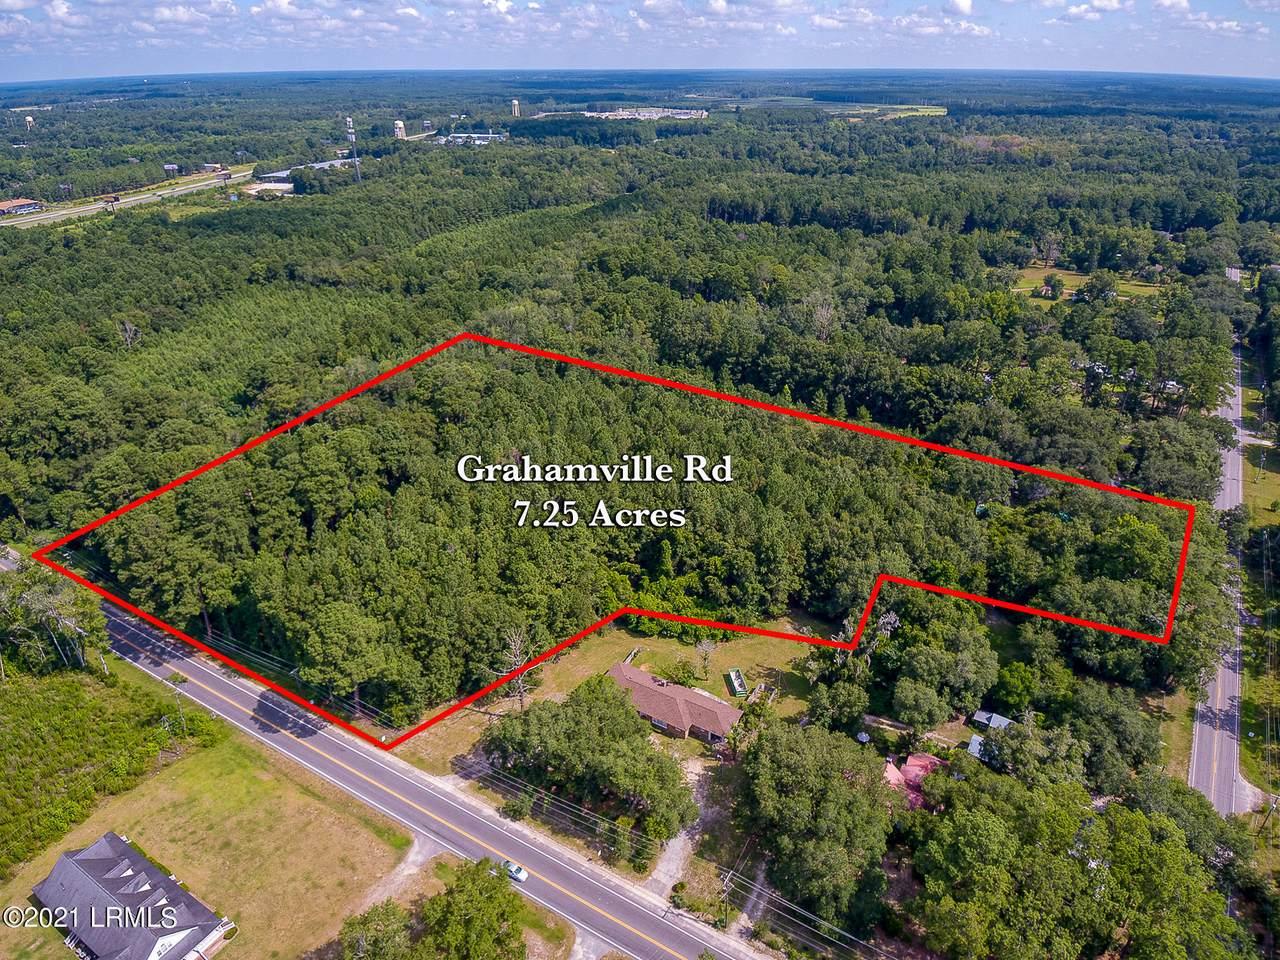 001 Grahamville Road - Photo 1